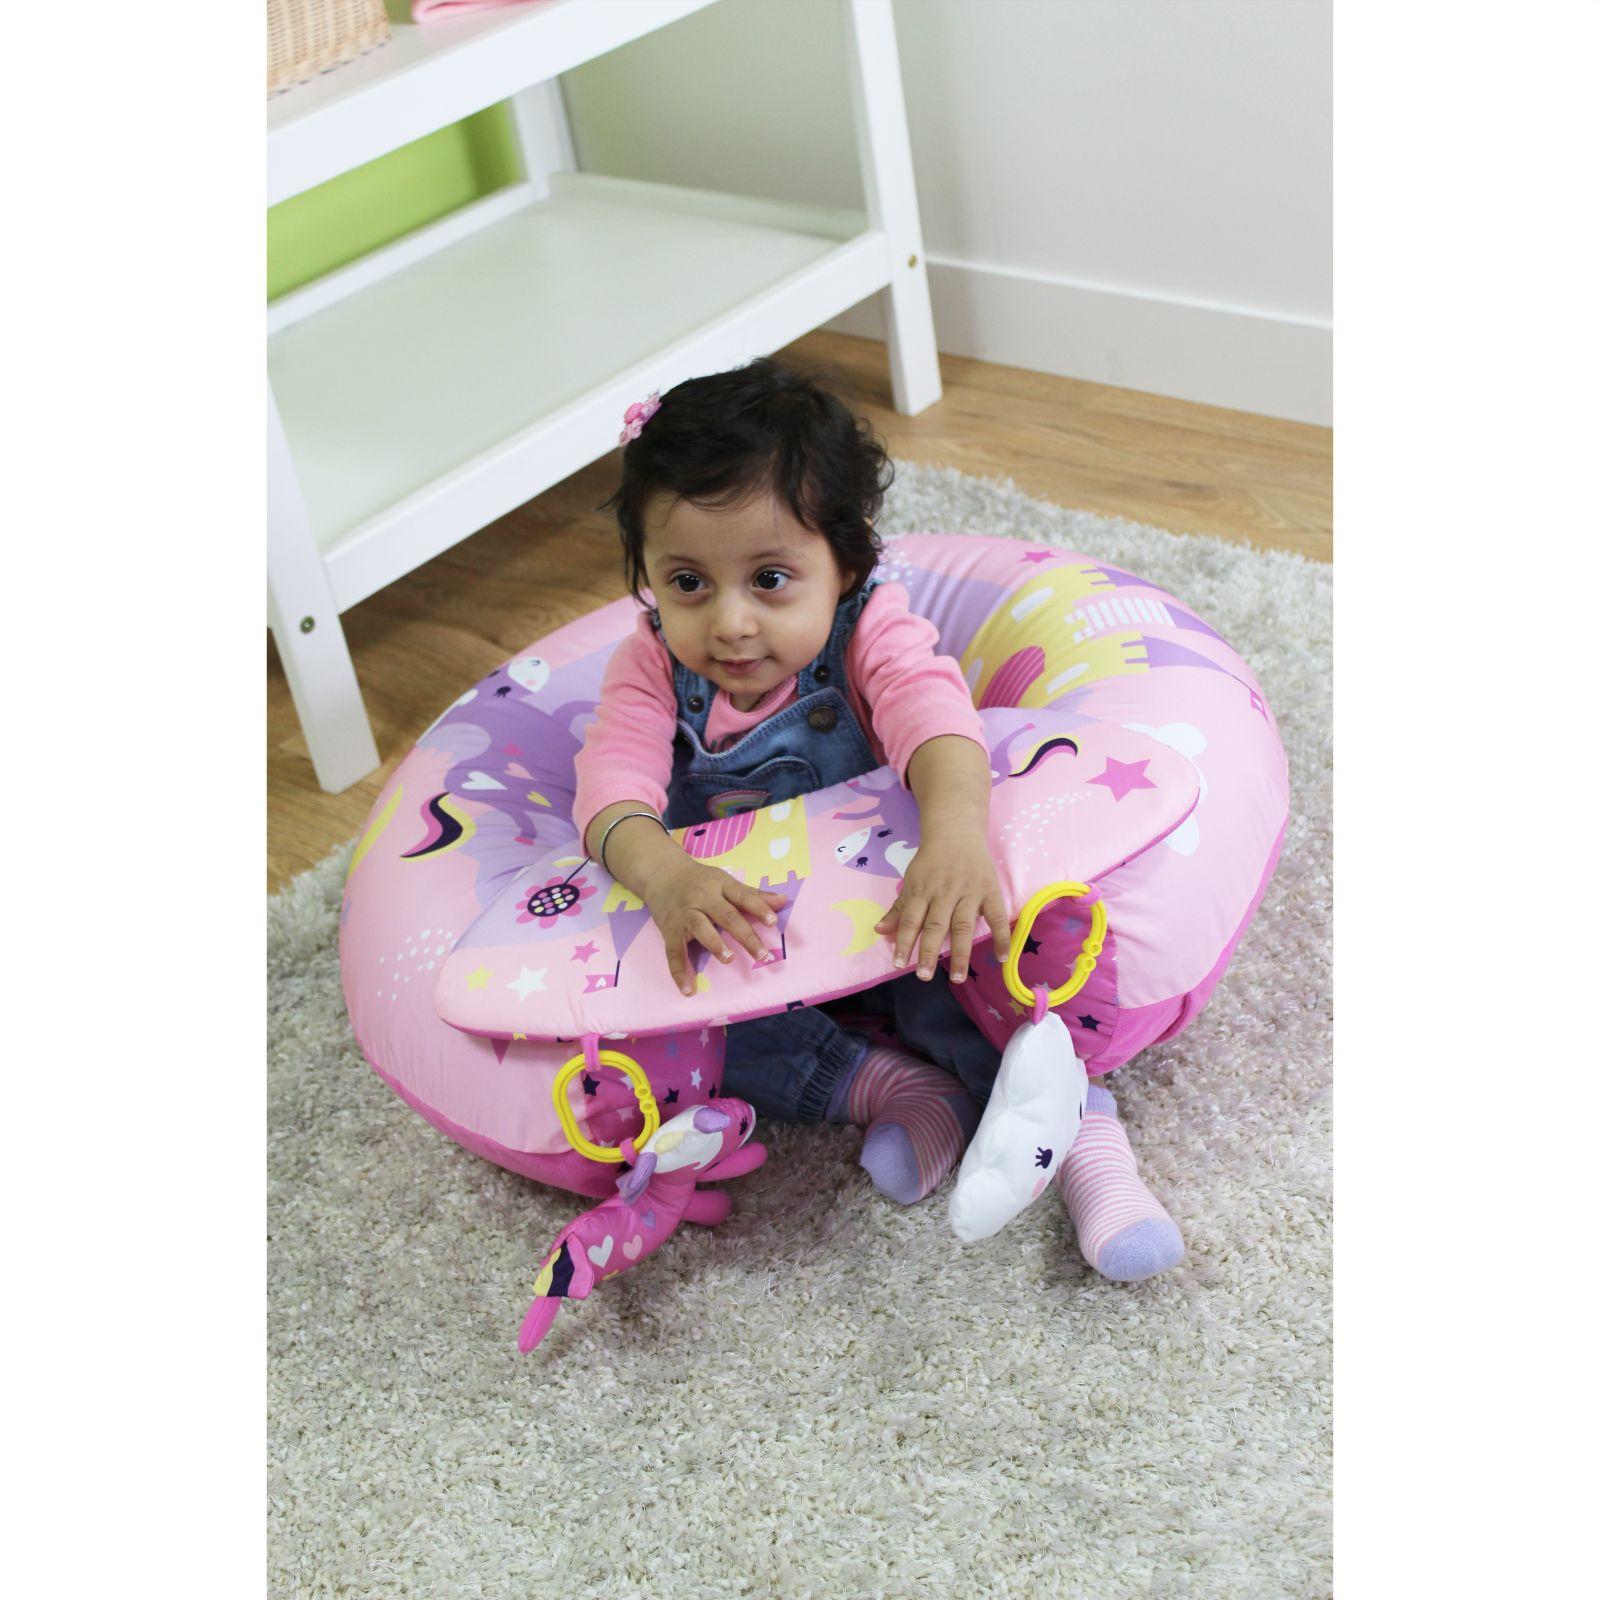 New Red Kite Pink Unicorn Sit Me Up Baby Playnest